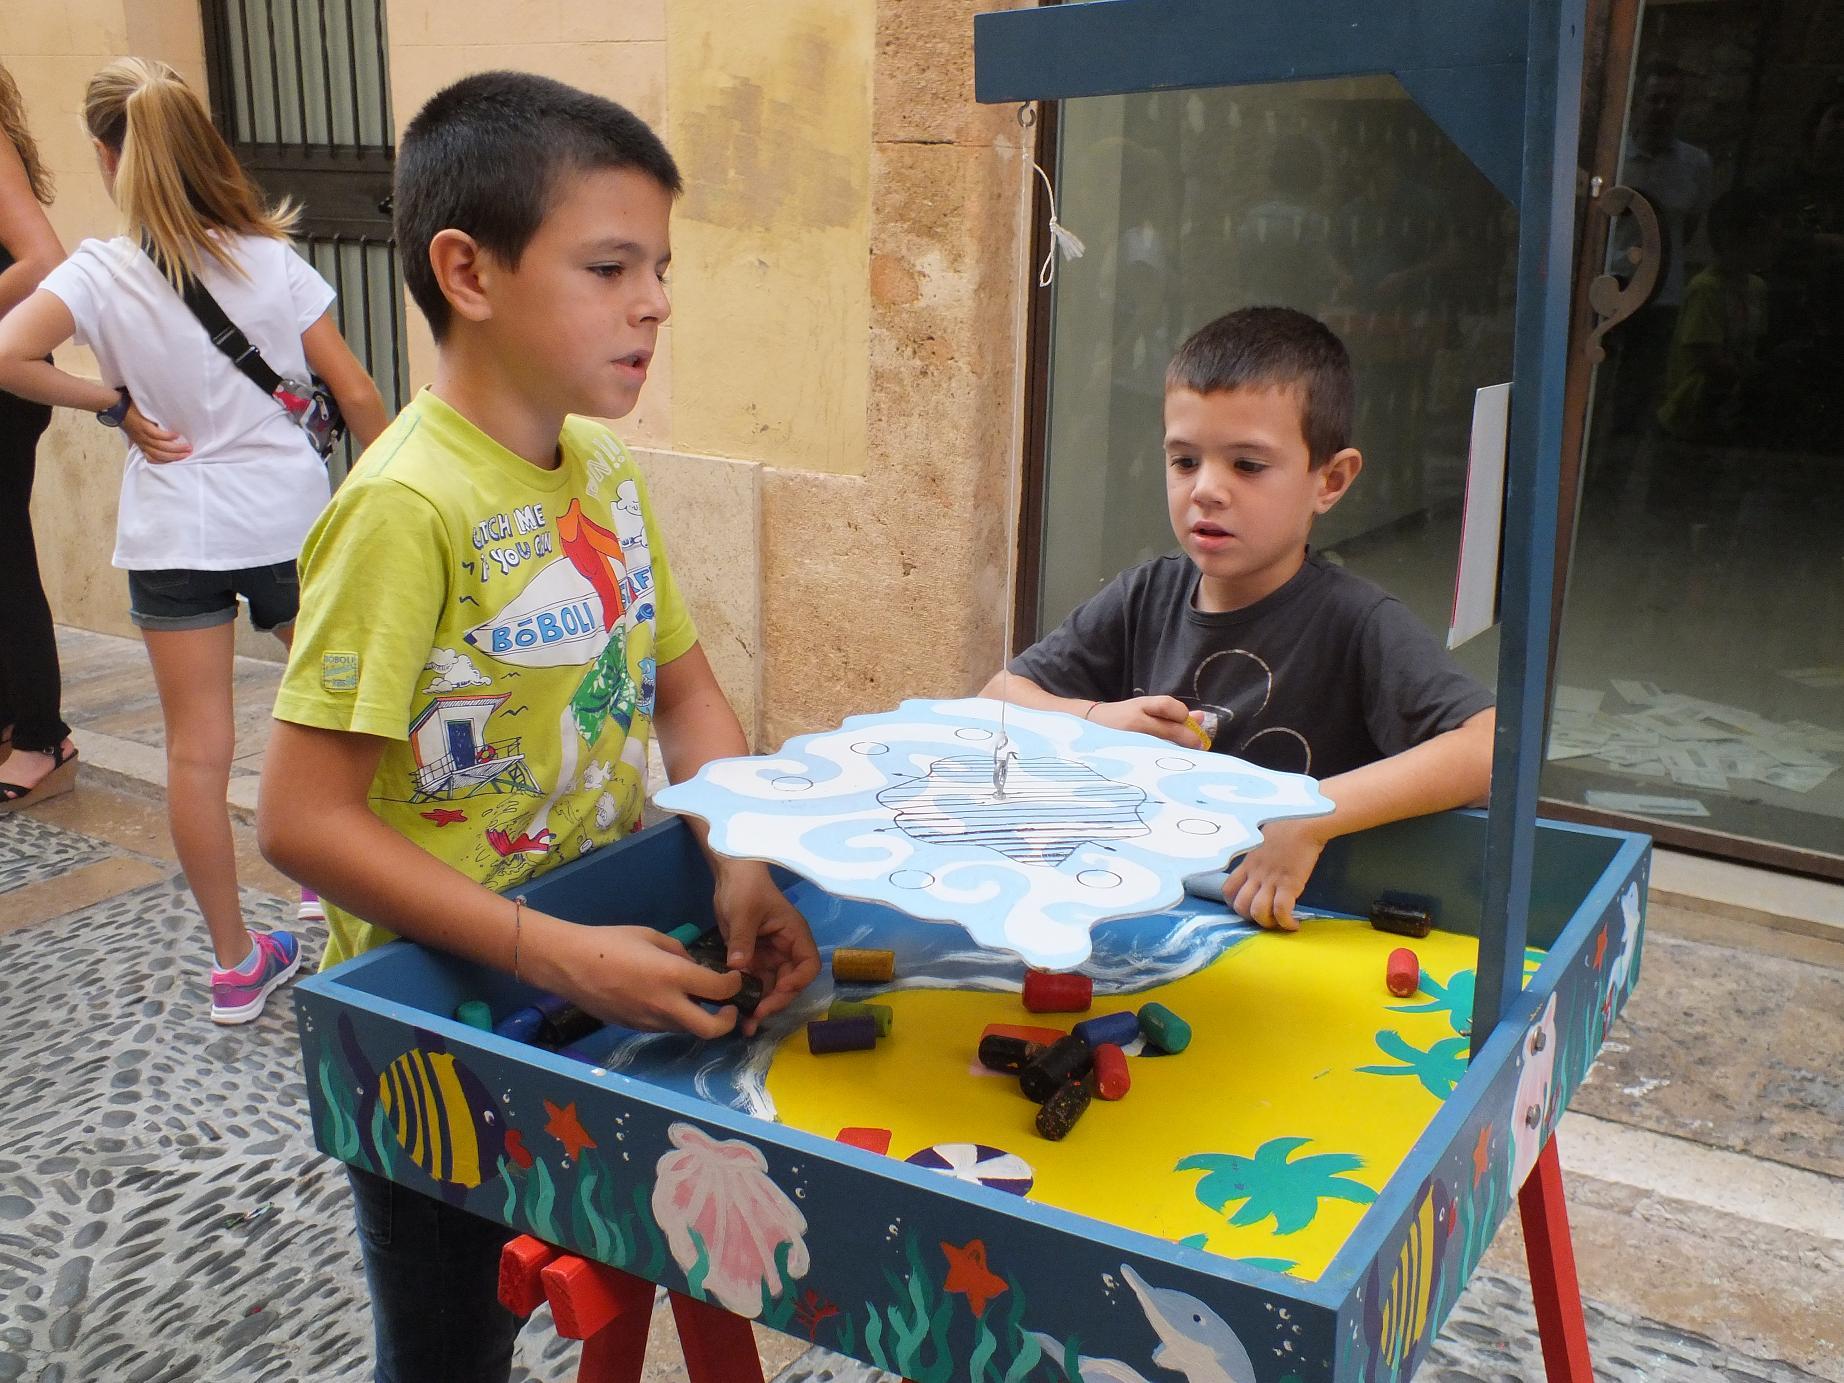 Tarragona_children street games_balance